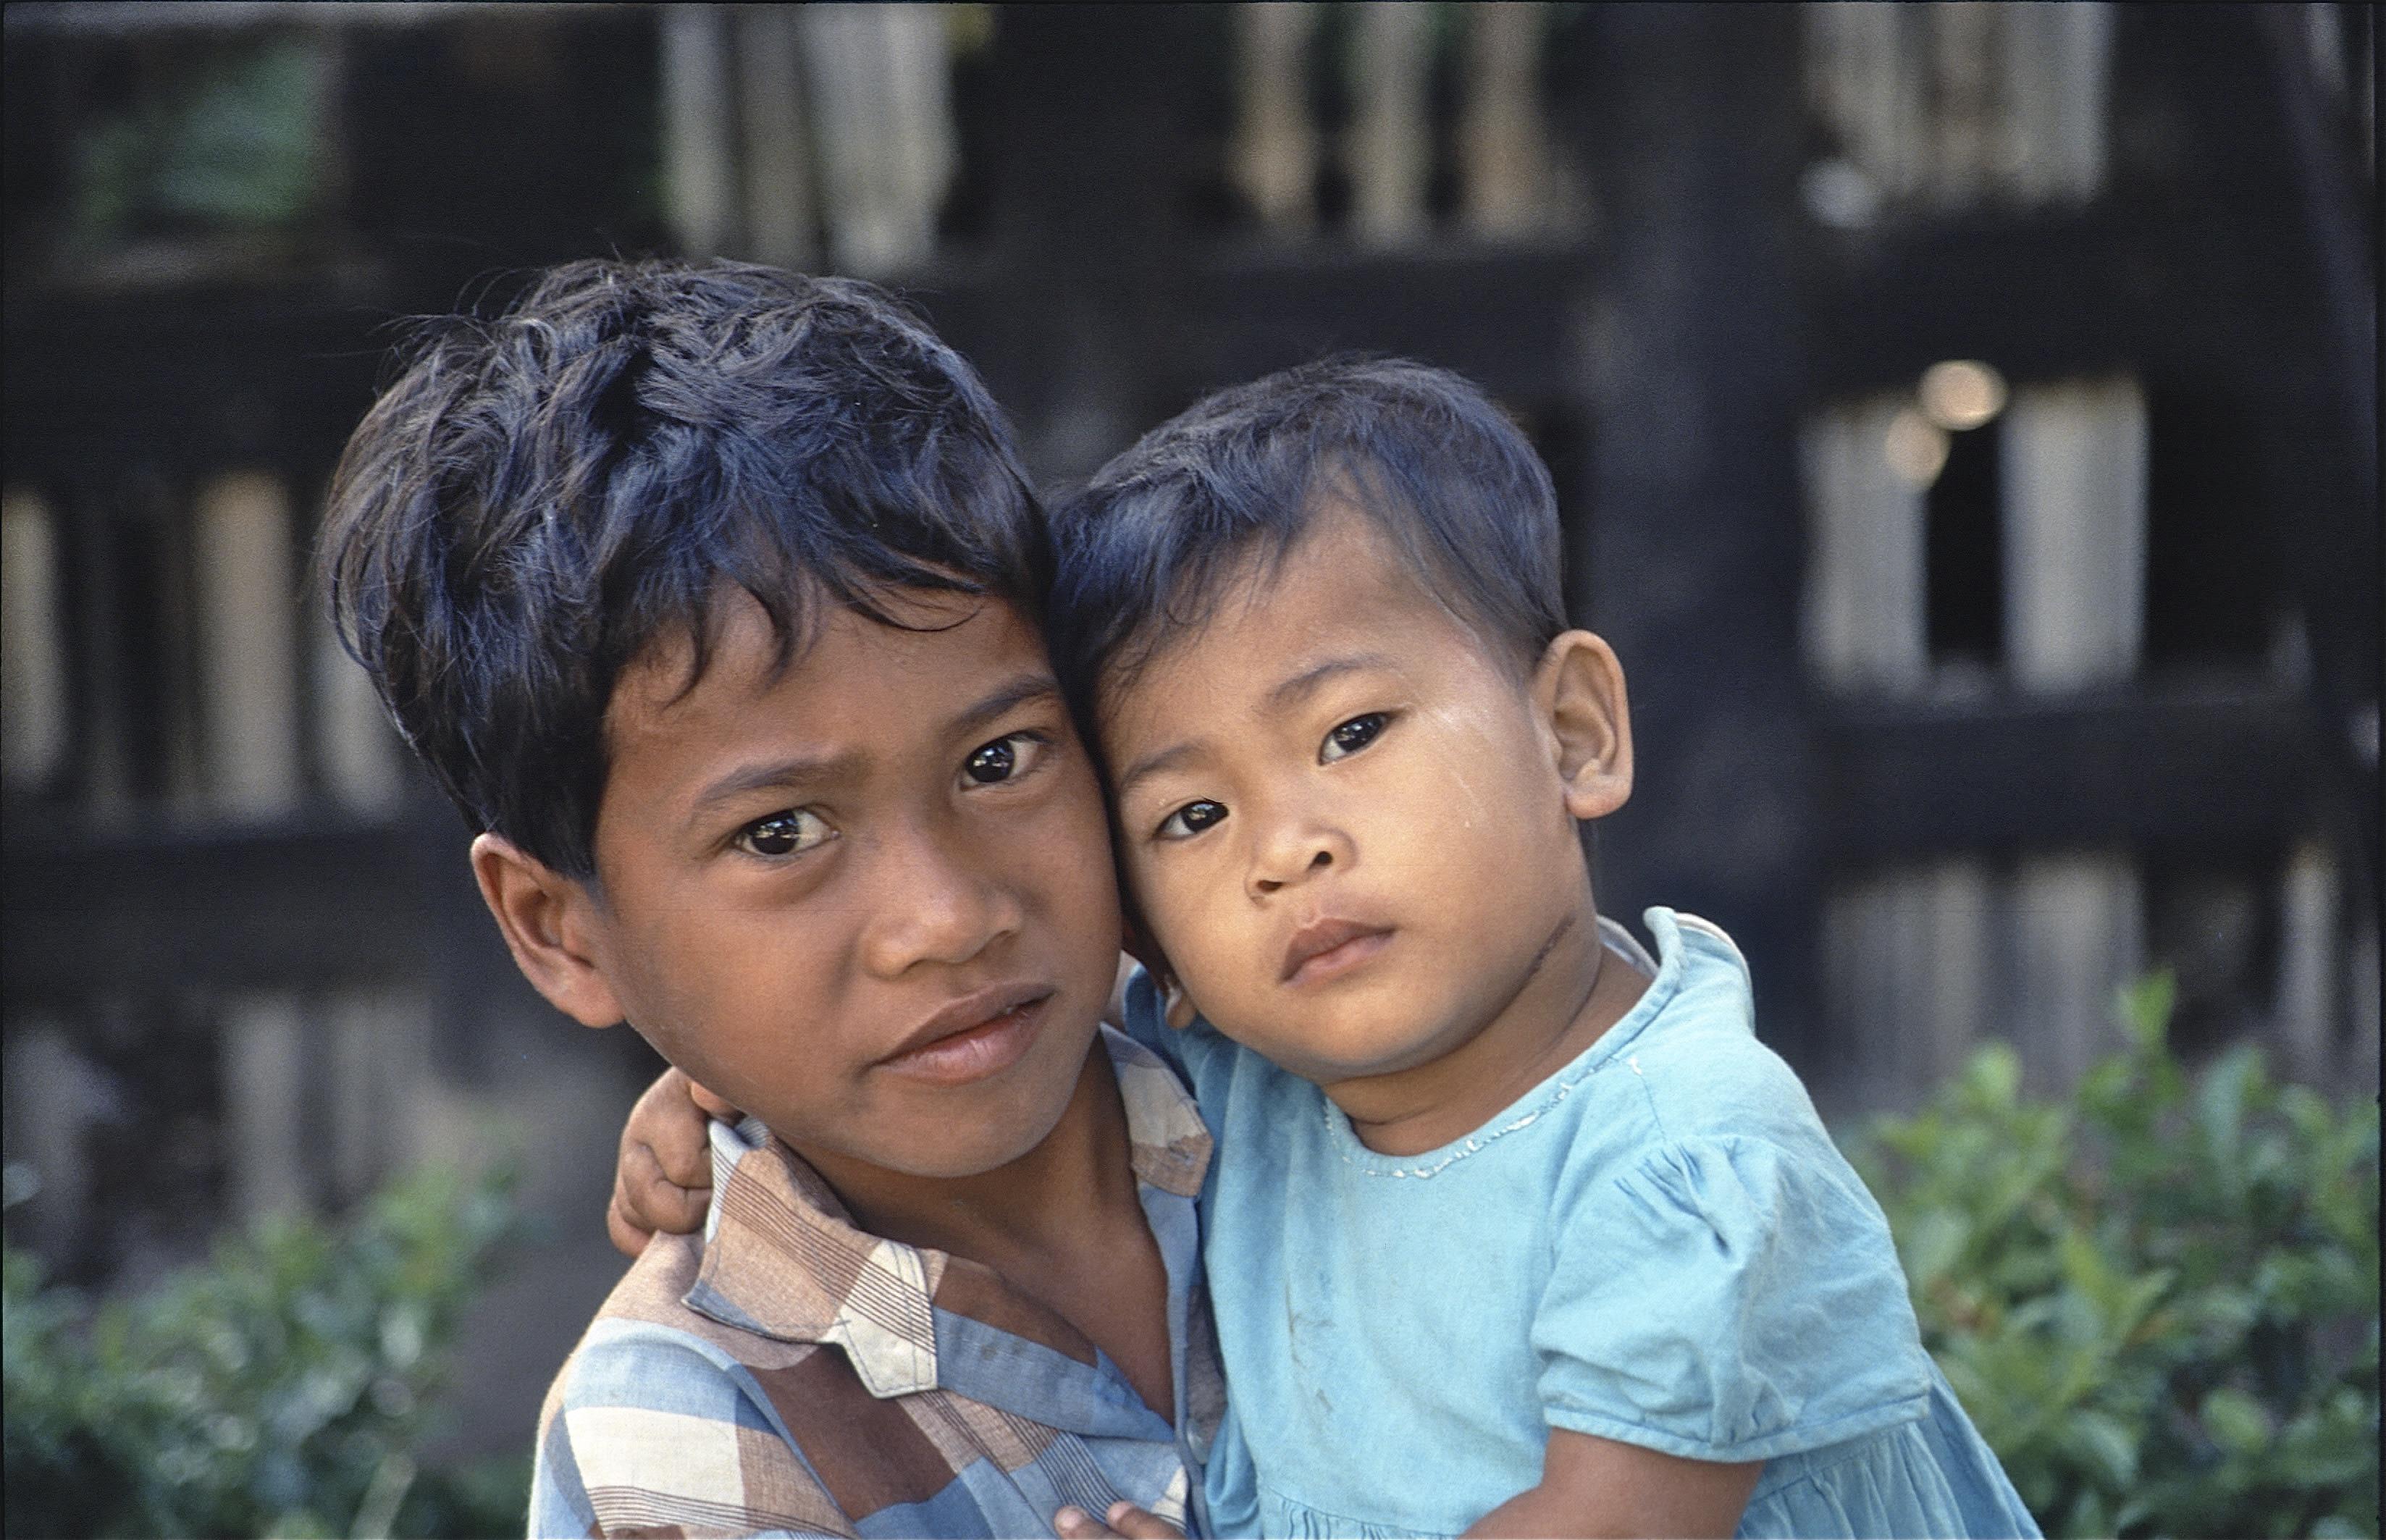 1993, Sumatra